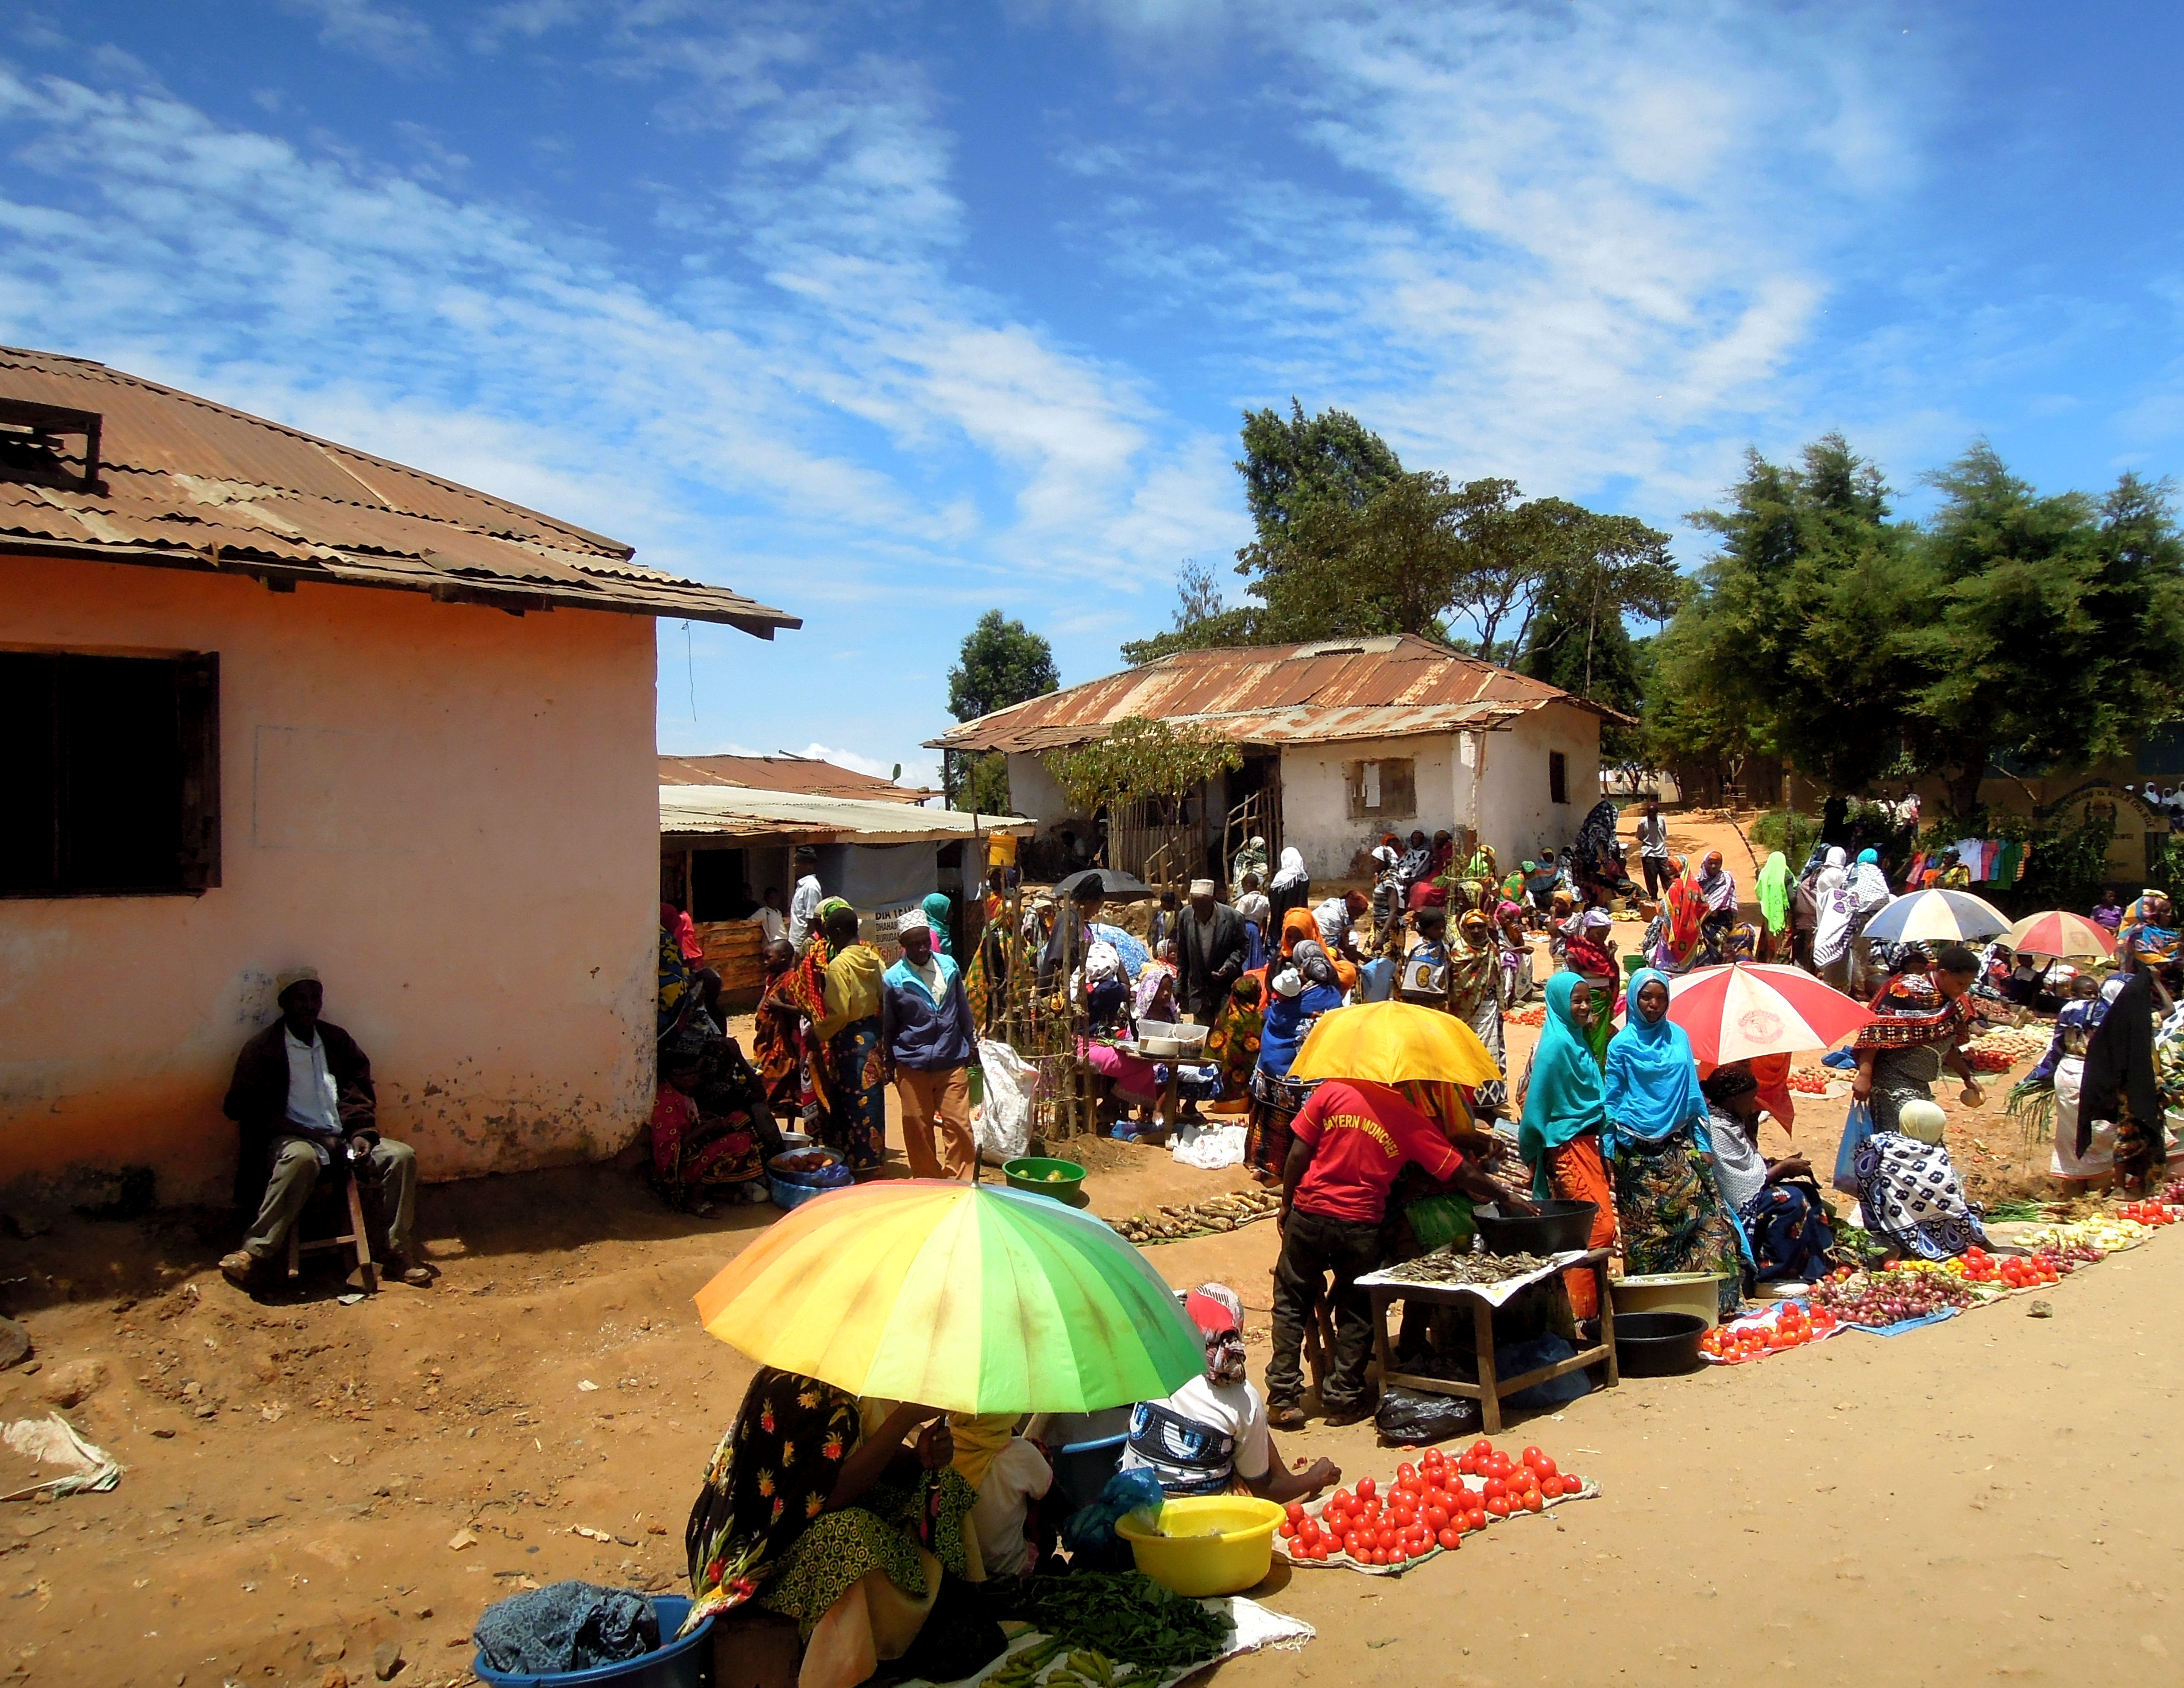 Mtae Village, Usambara Mountains, Tanzania, fot. M. Lehrmann